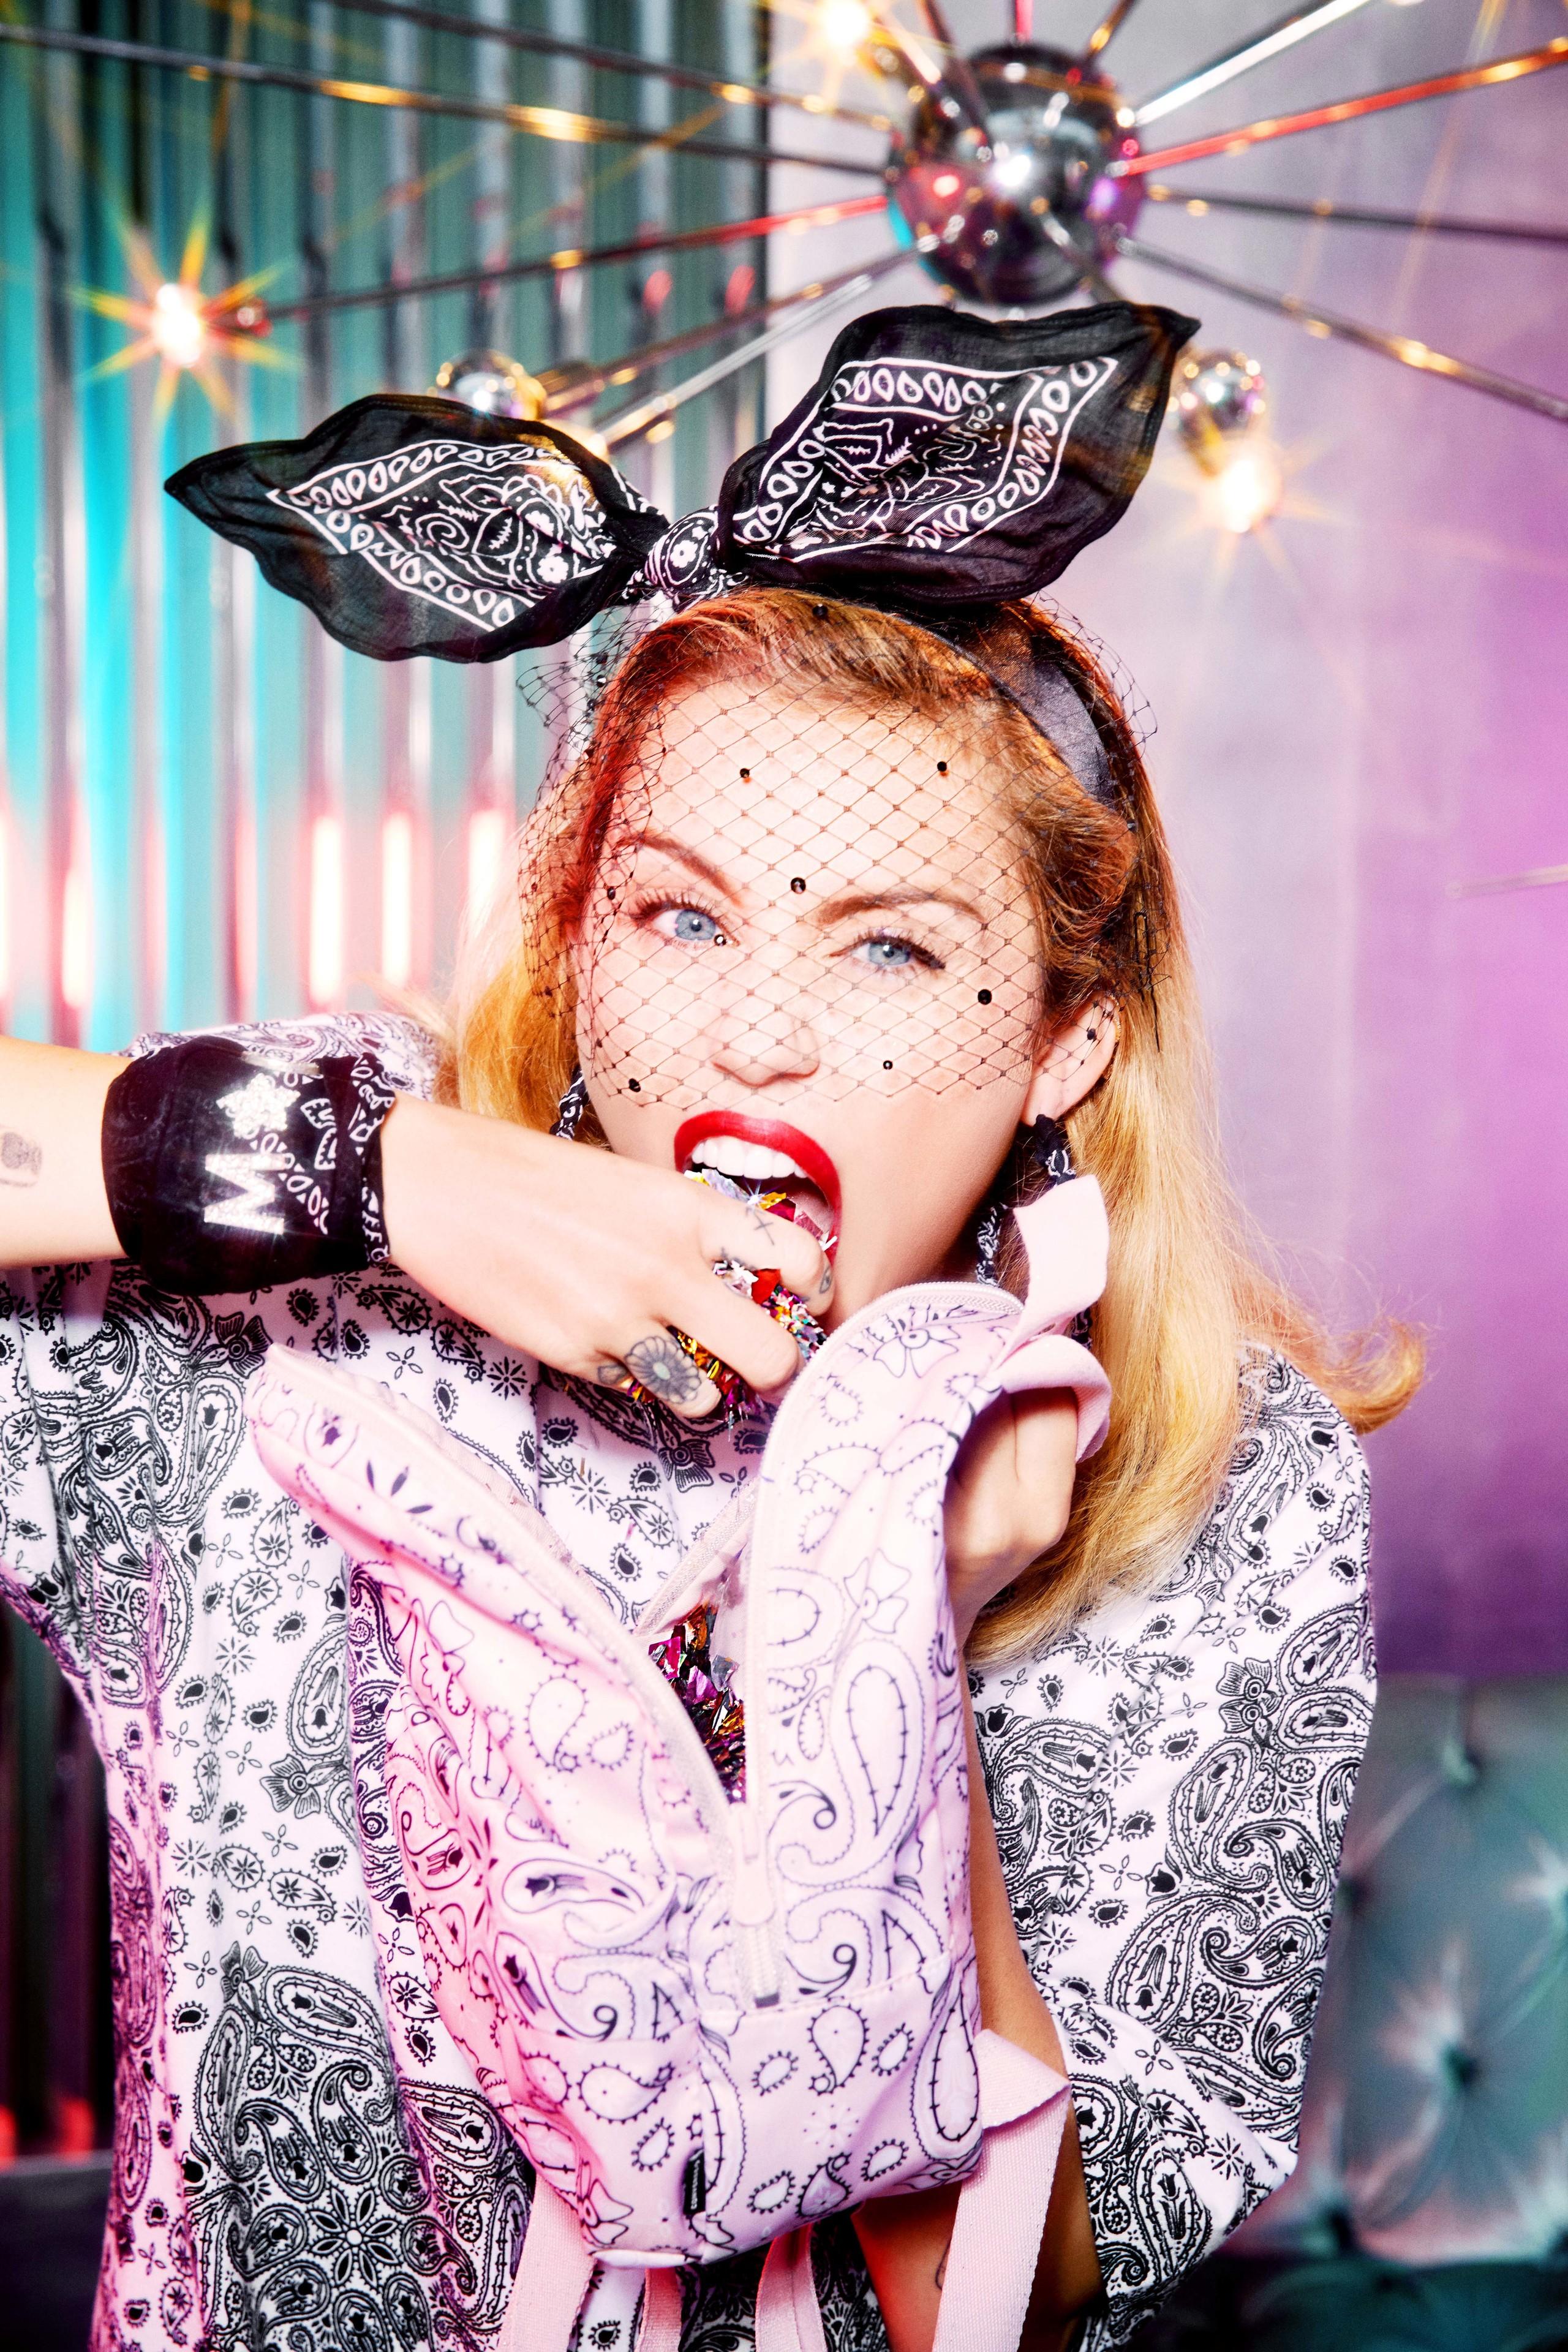 Converse x Miley Cyrus x Bershka